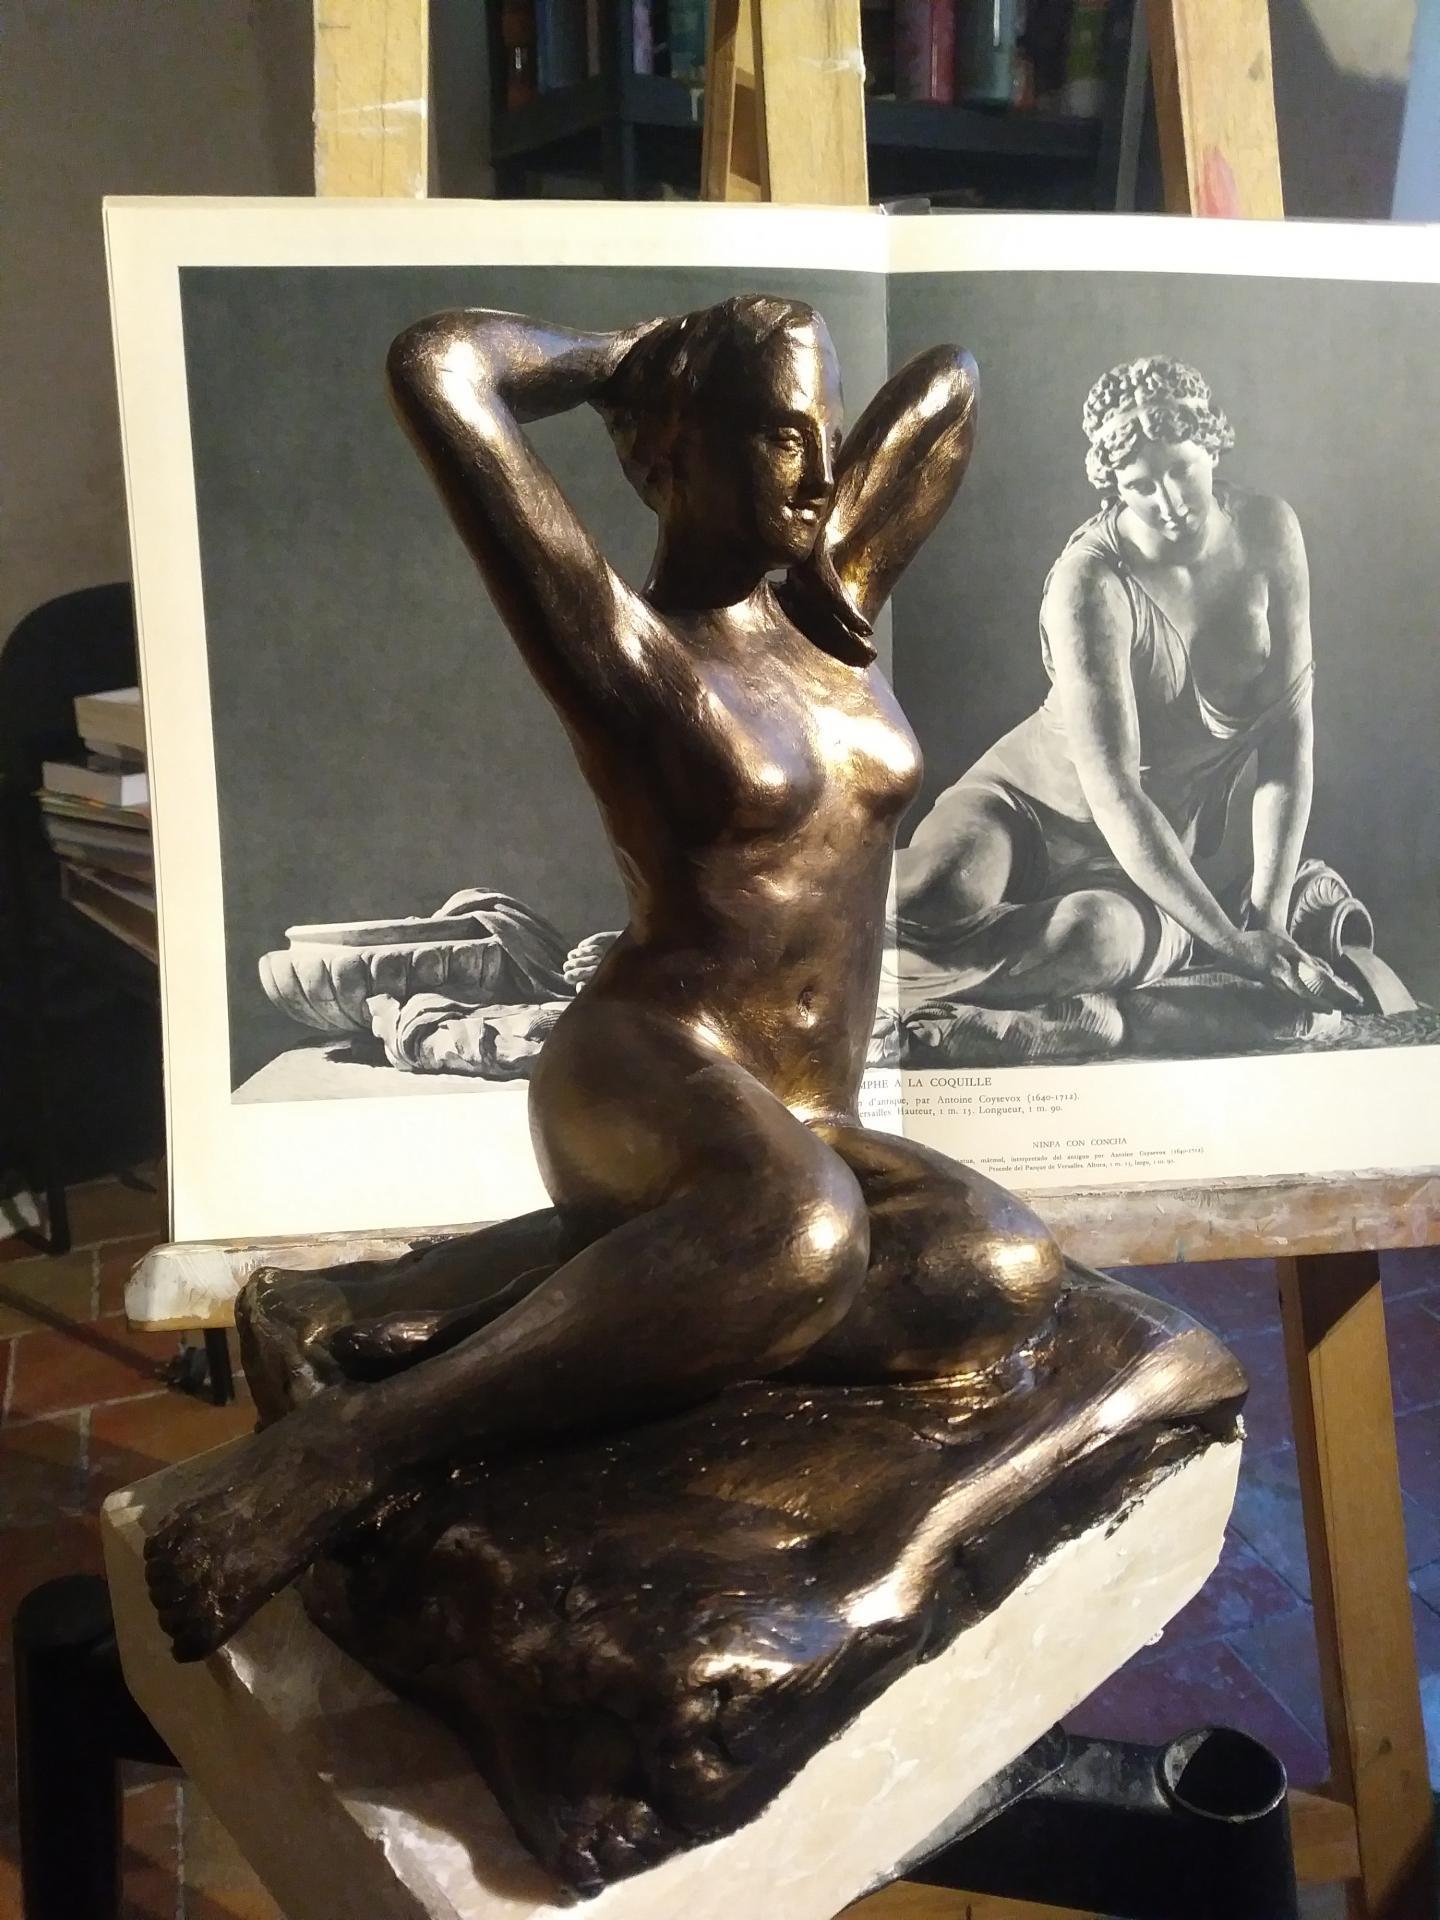 Nue sculpture en terre patinee de jean joseph chevalier 2